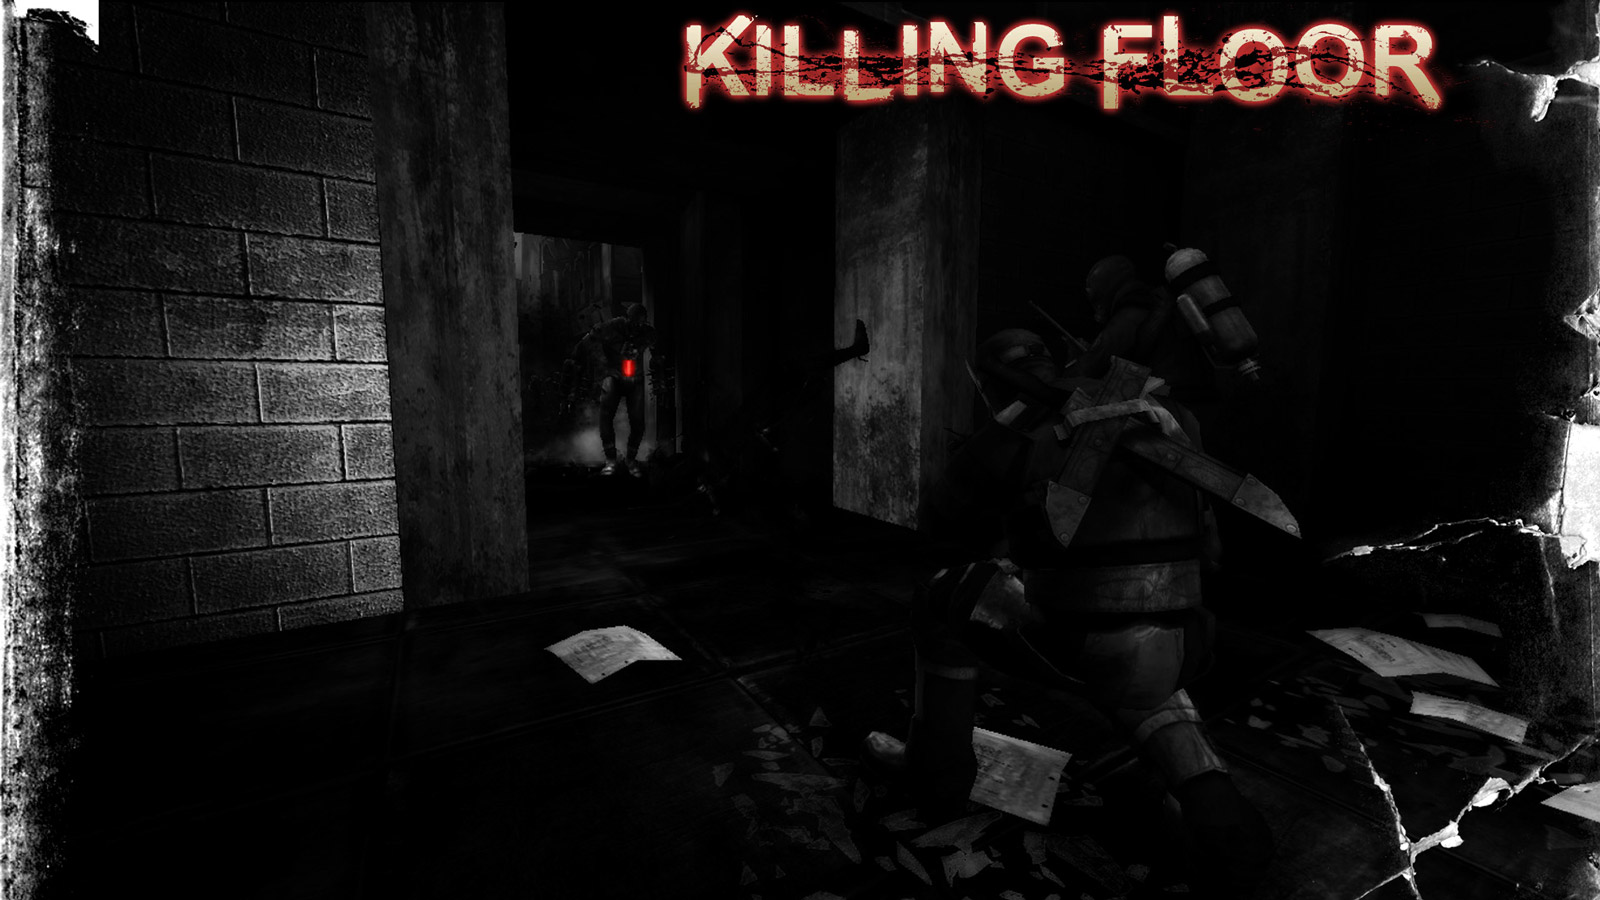 Free Killing Floor Wallpaper in 1600x900